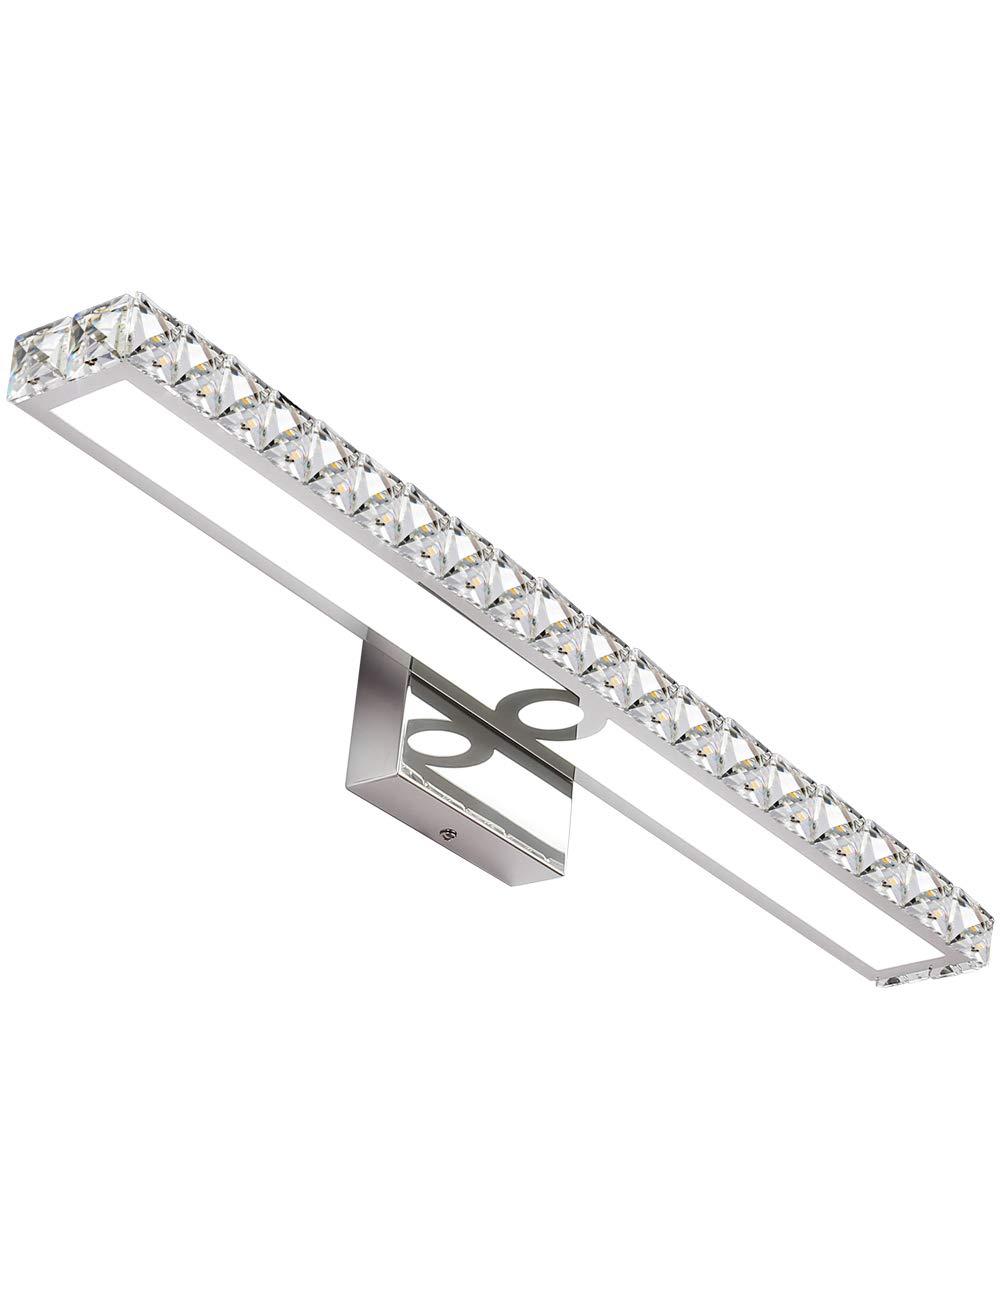 SOLFART LED Vanity Lights Over Mirror,25.4 inch 24W,Crystal Wall Lights for Bathroom Lighting Fixtures